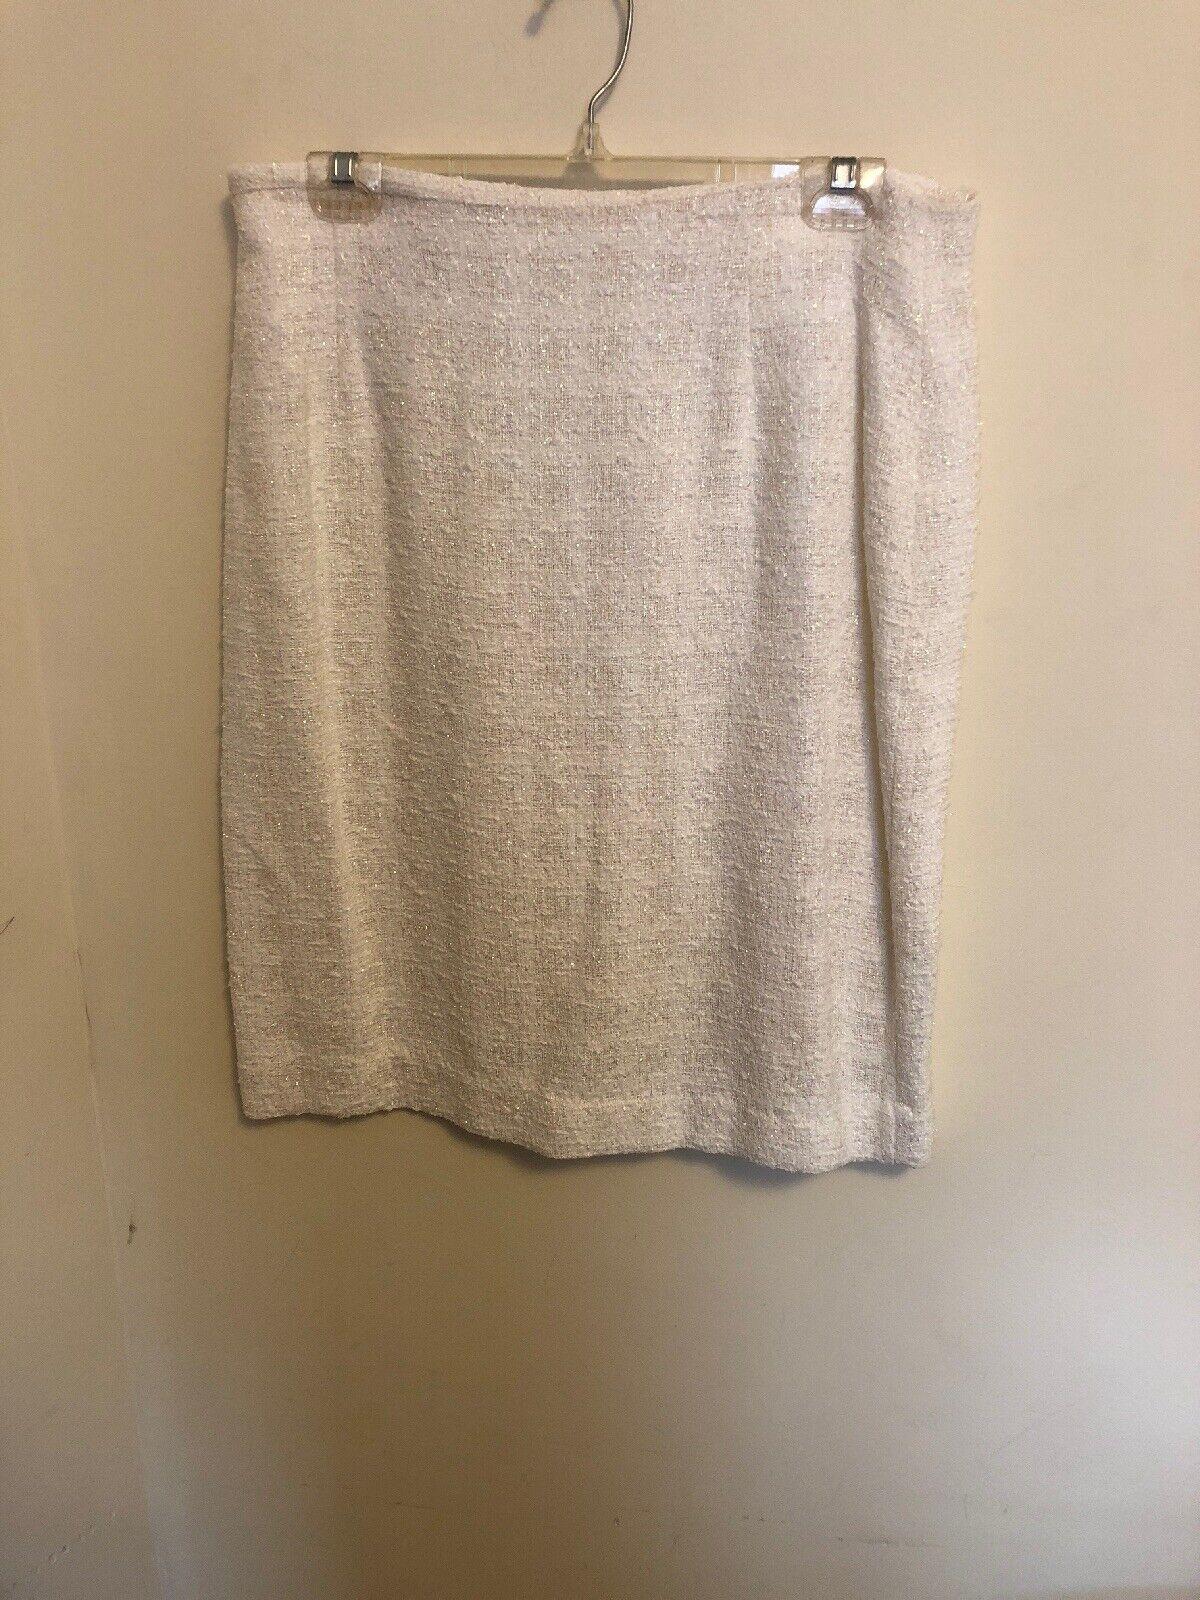 greenigo Paris Metallic Boucle Tweeded White Sparkle color Pencil Skirt SZ 42 10